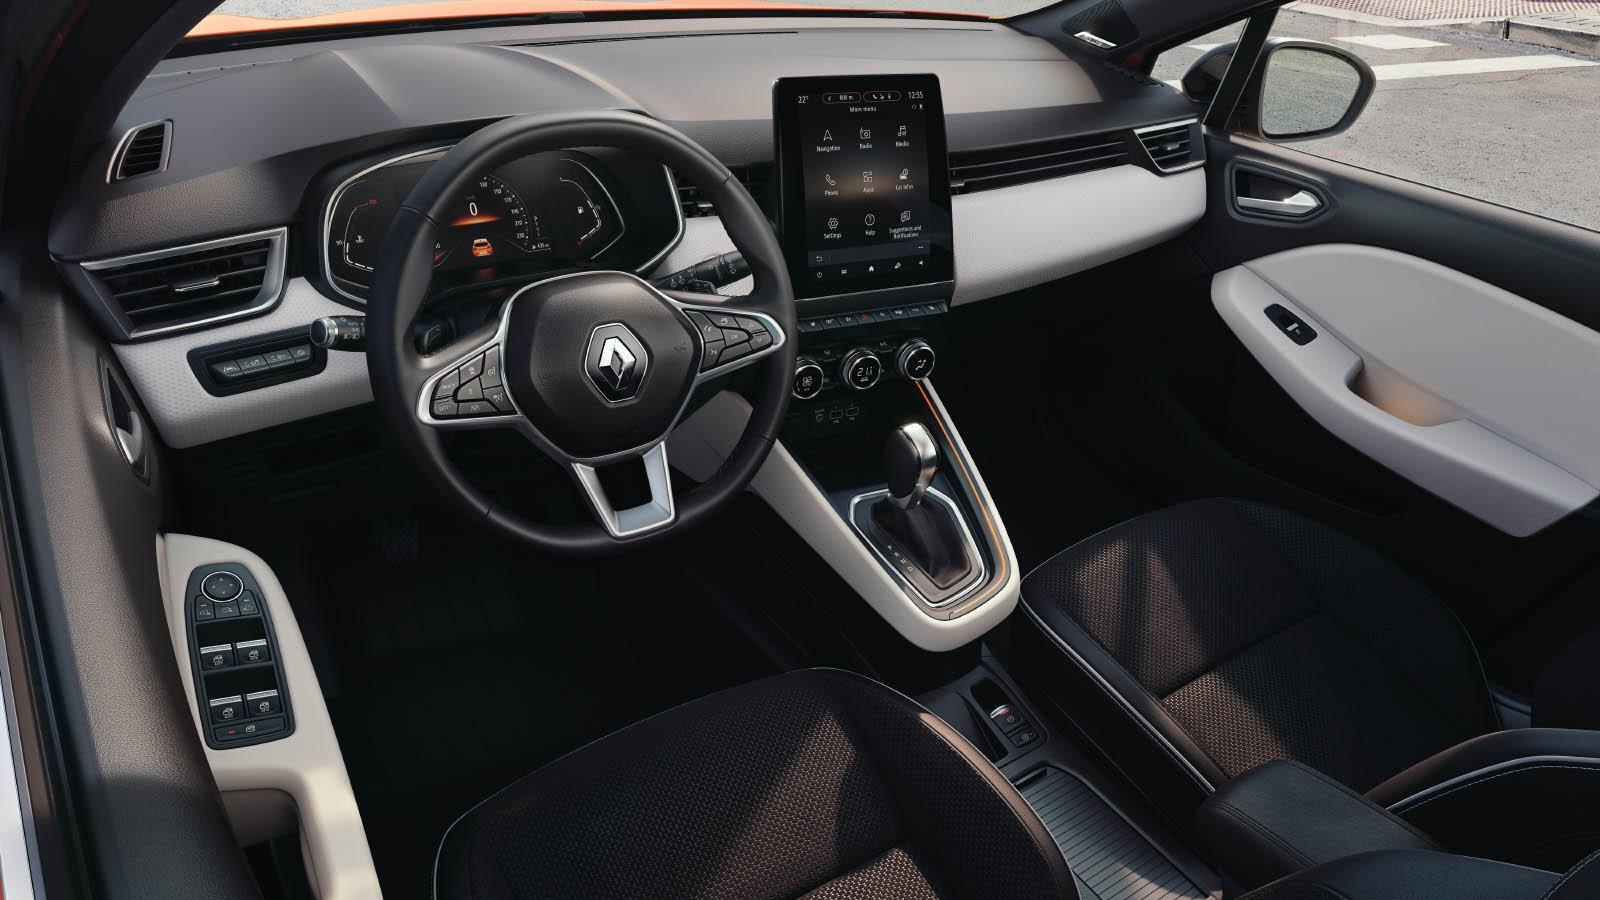 Renault Clio [Worldwide] '2019